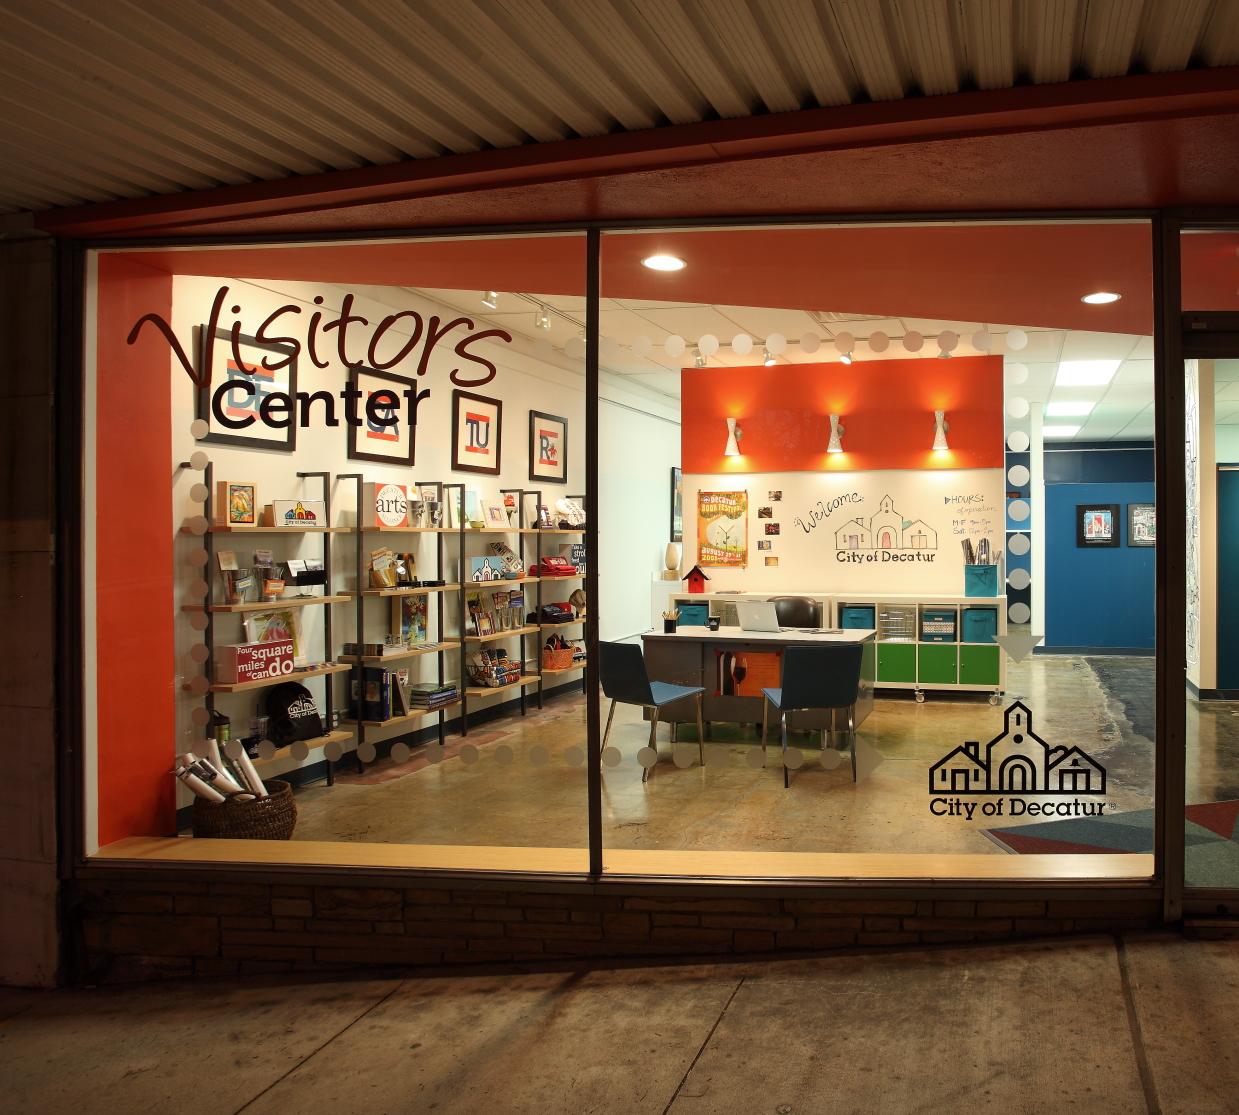 Decatur Visitor's Center